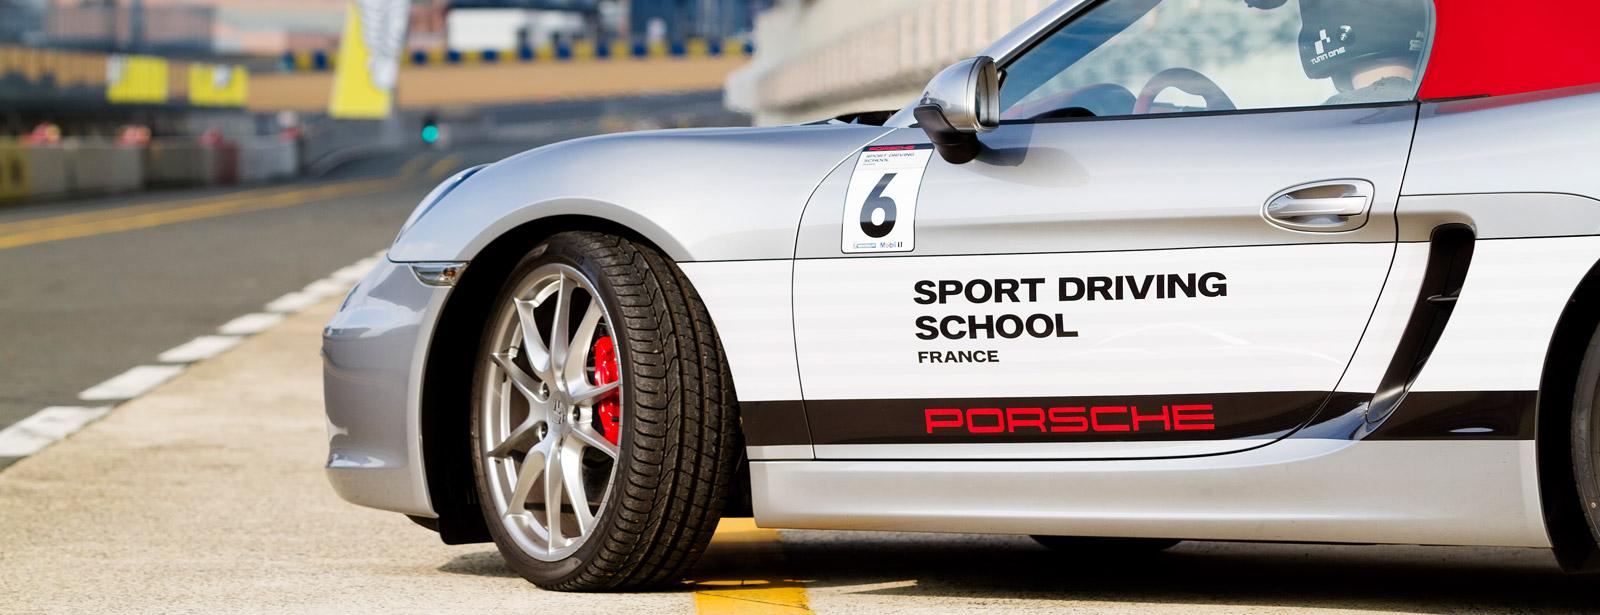 Porsche Driving School >> Porsche Driving School 2018 2019 Car Release And Reviews